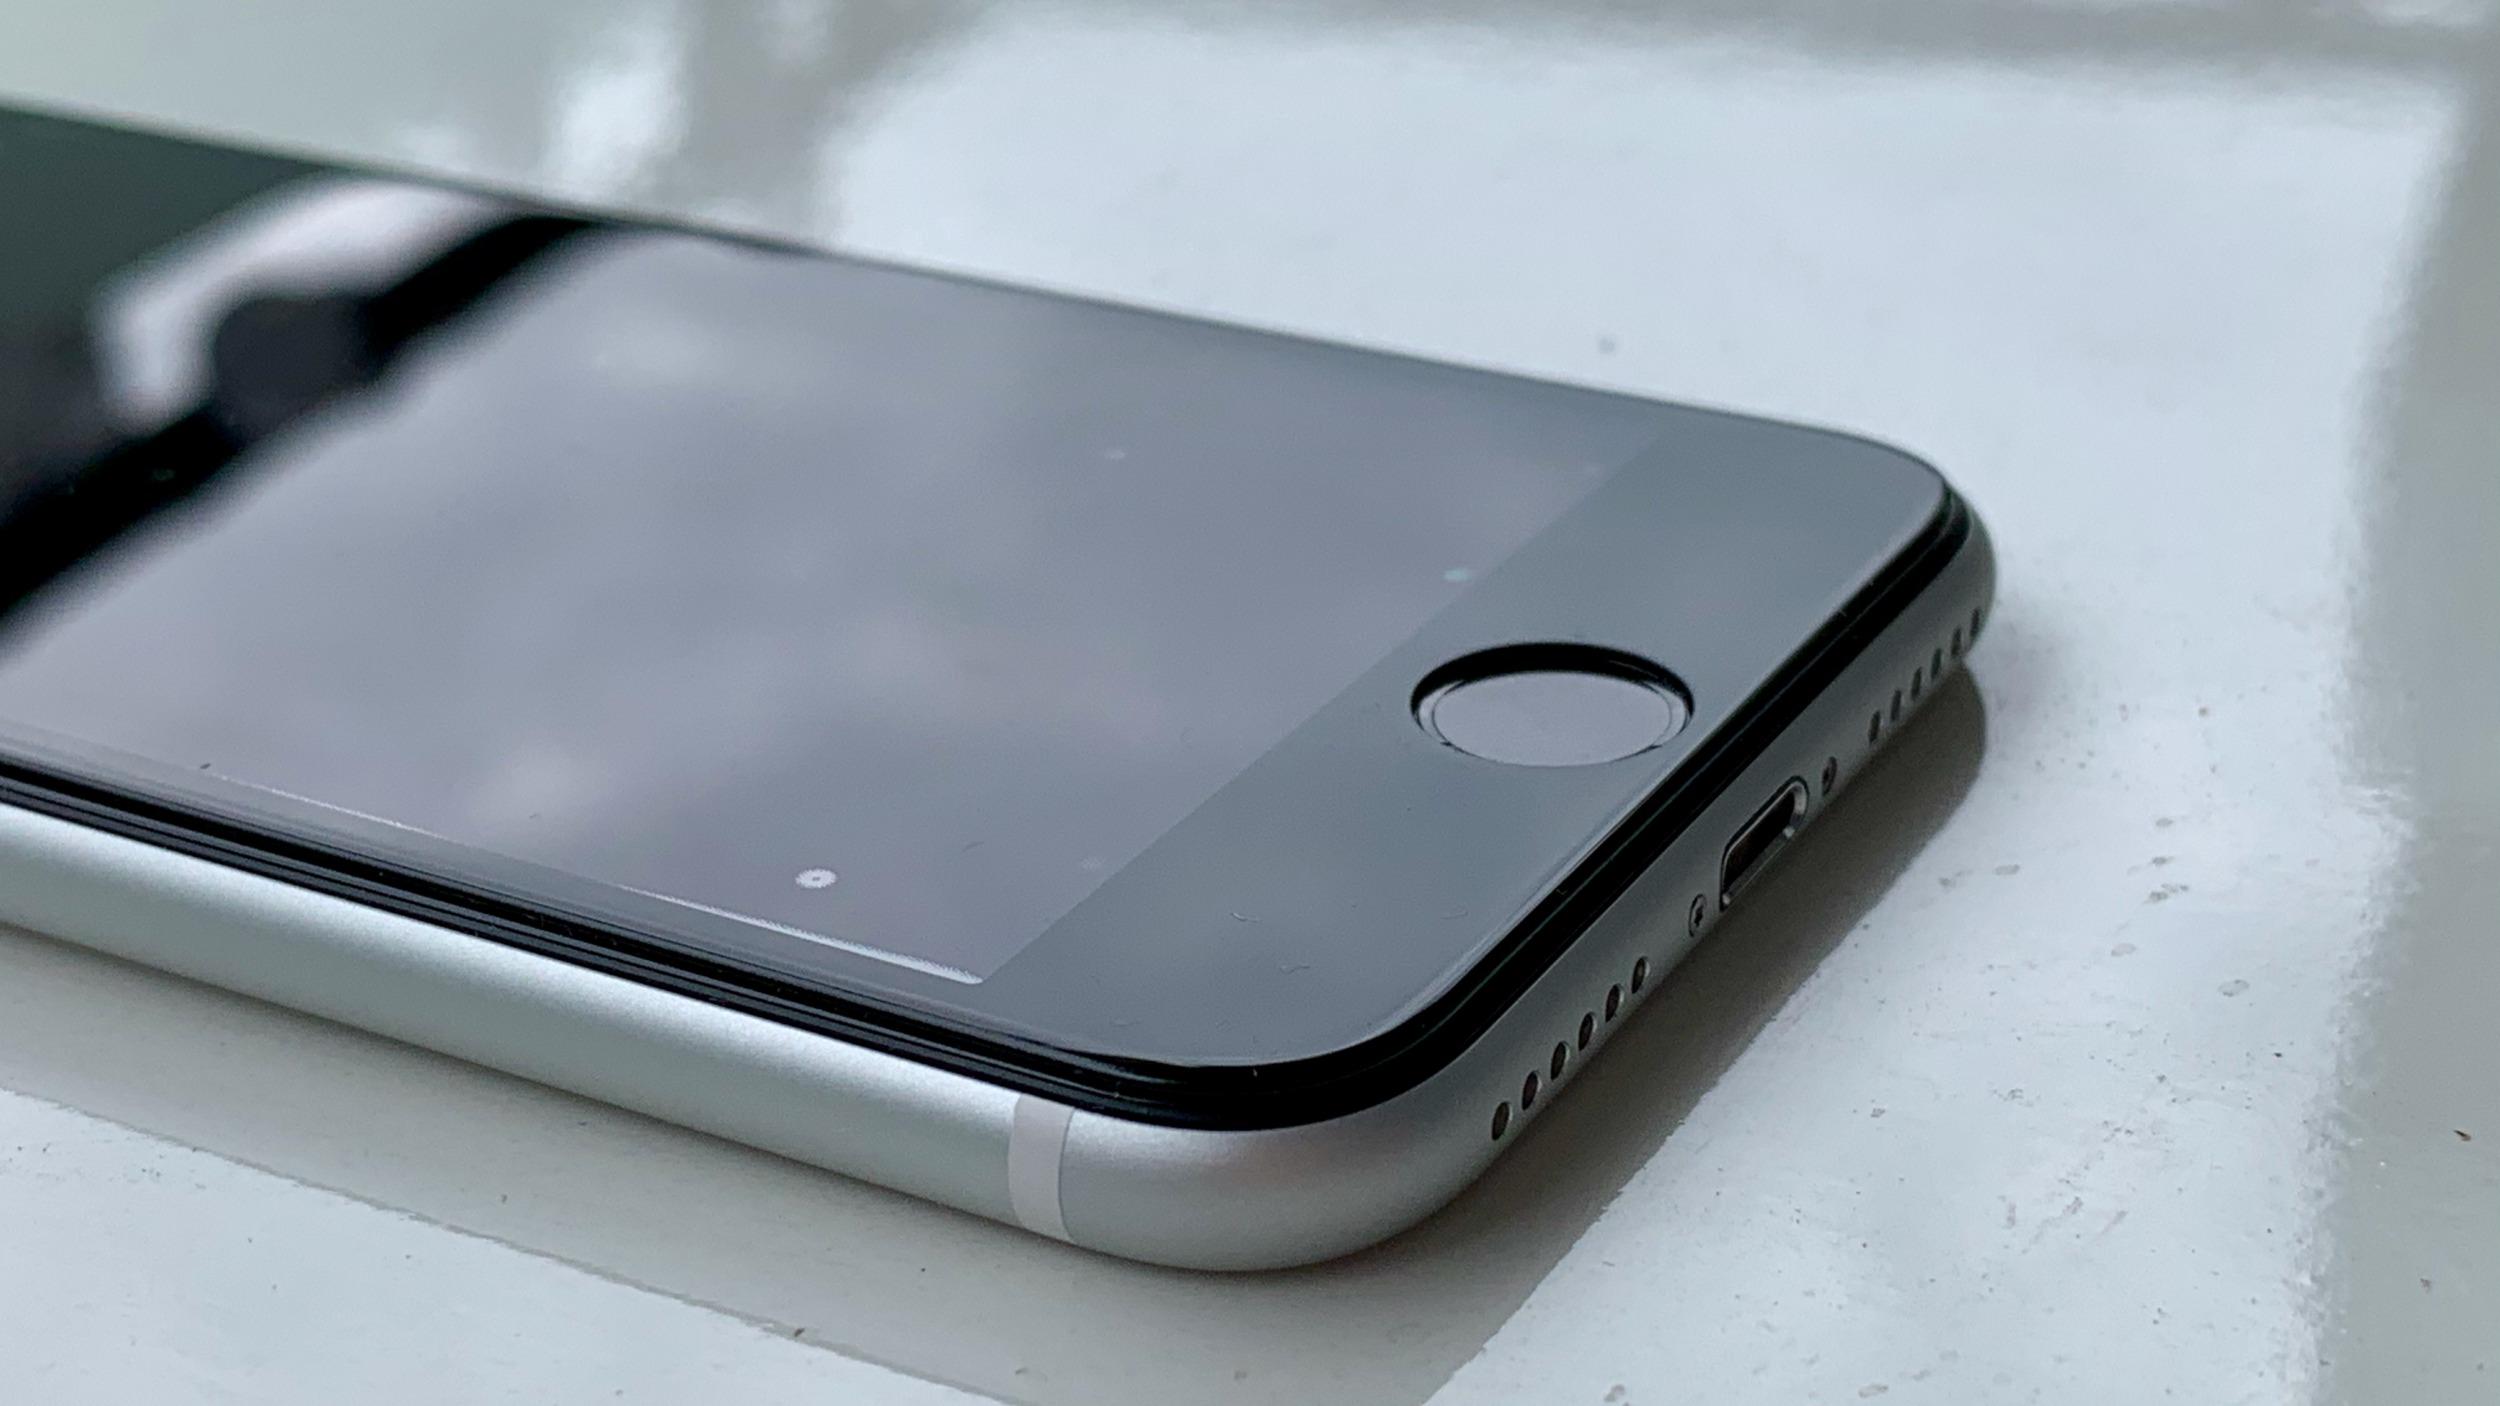 Tvrzené sklo pro iPhone SE nezklamalo [recenze]